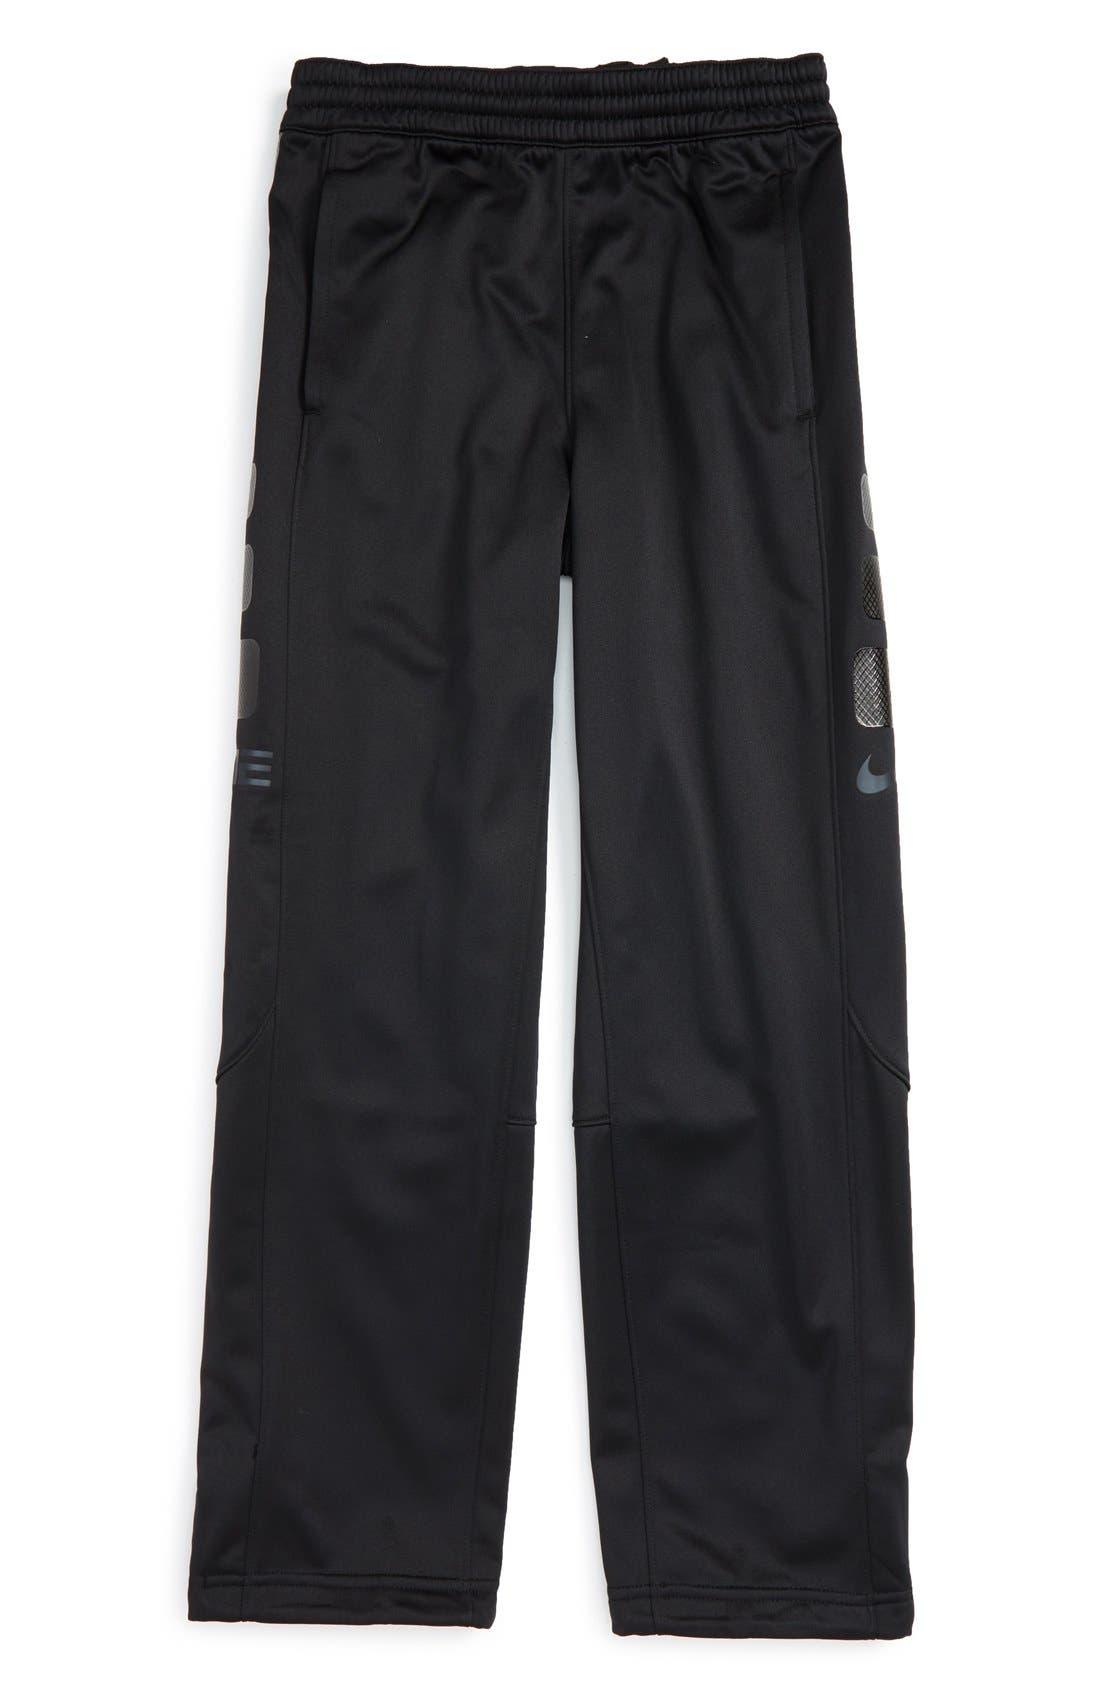 'Elite' Therma-FIT Pants,                         Main,                         color, 010